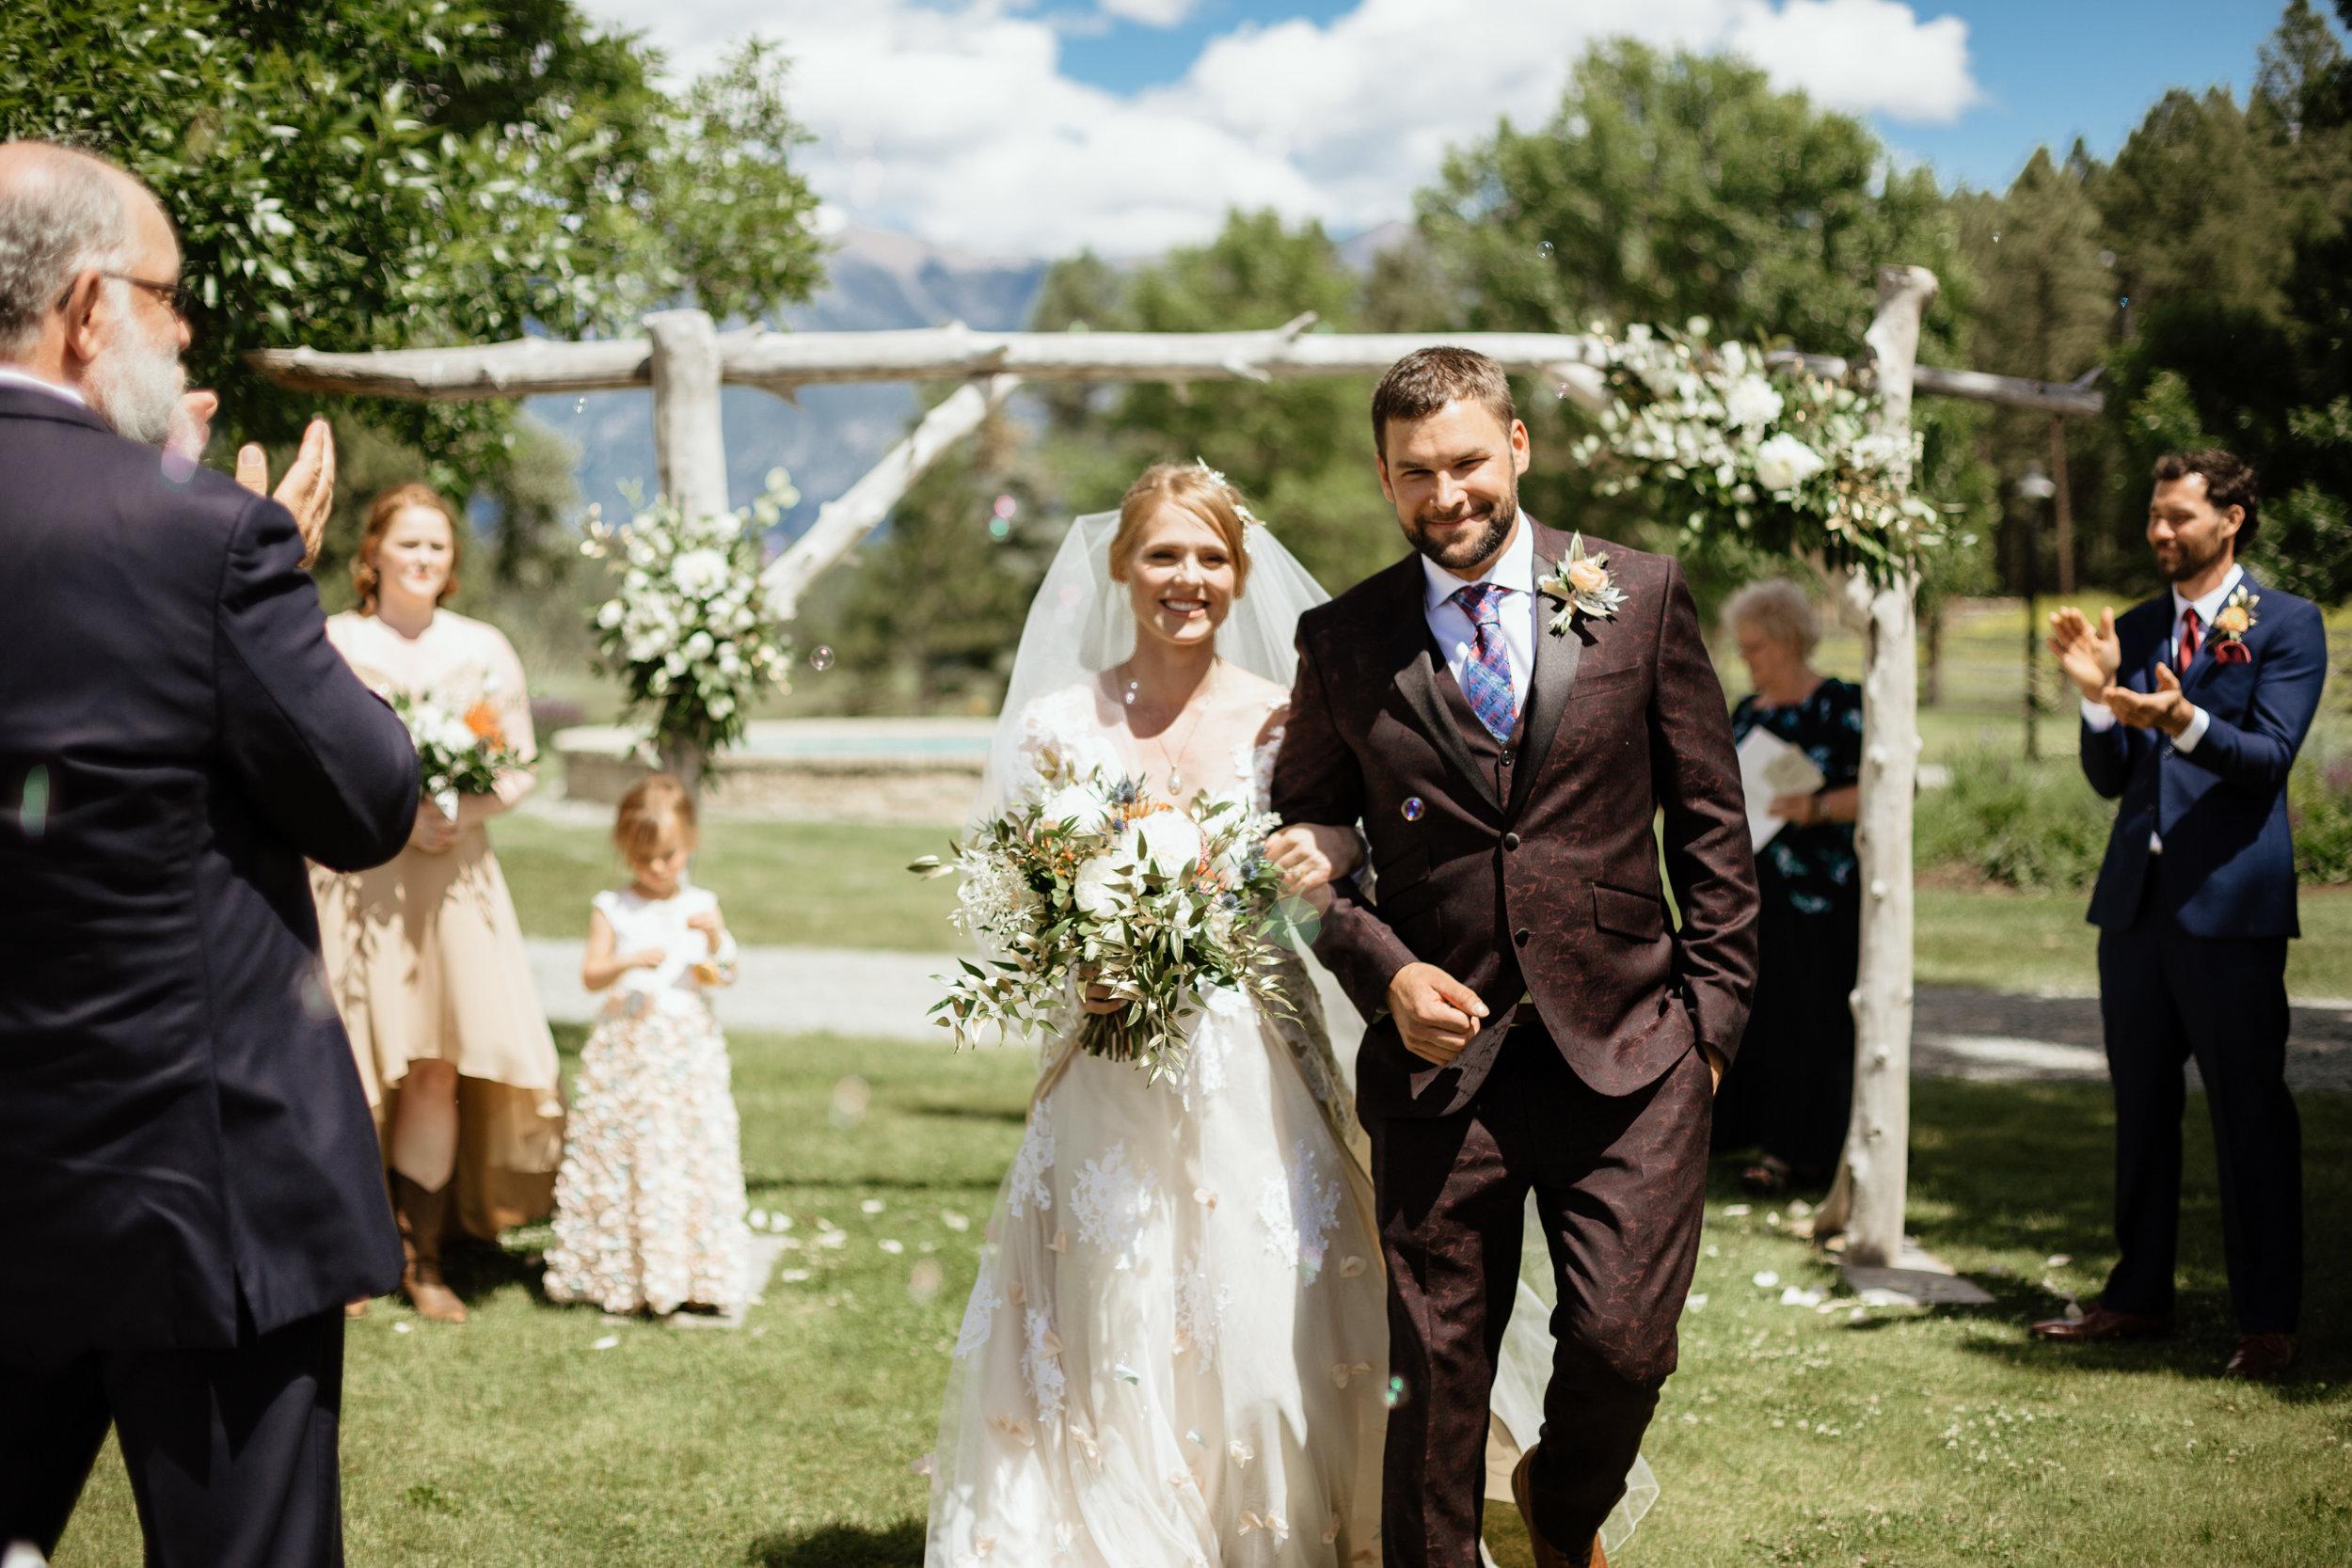 Dave + Amanda 2 - Ceremony-152.jpg